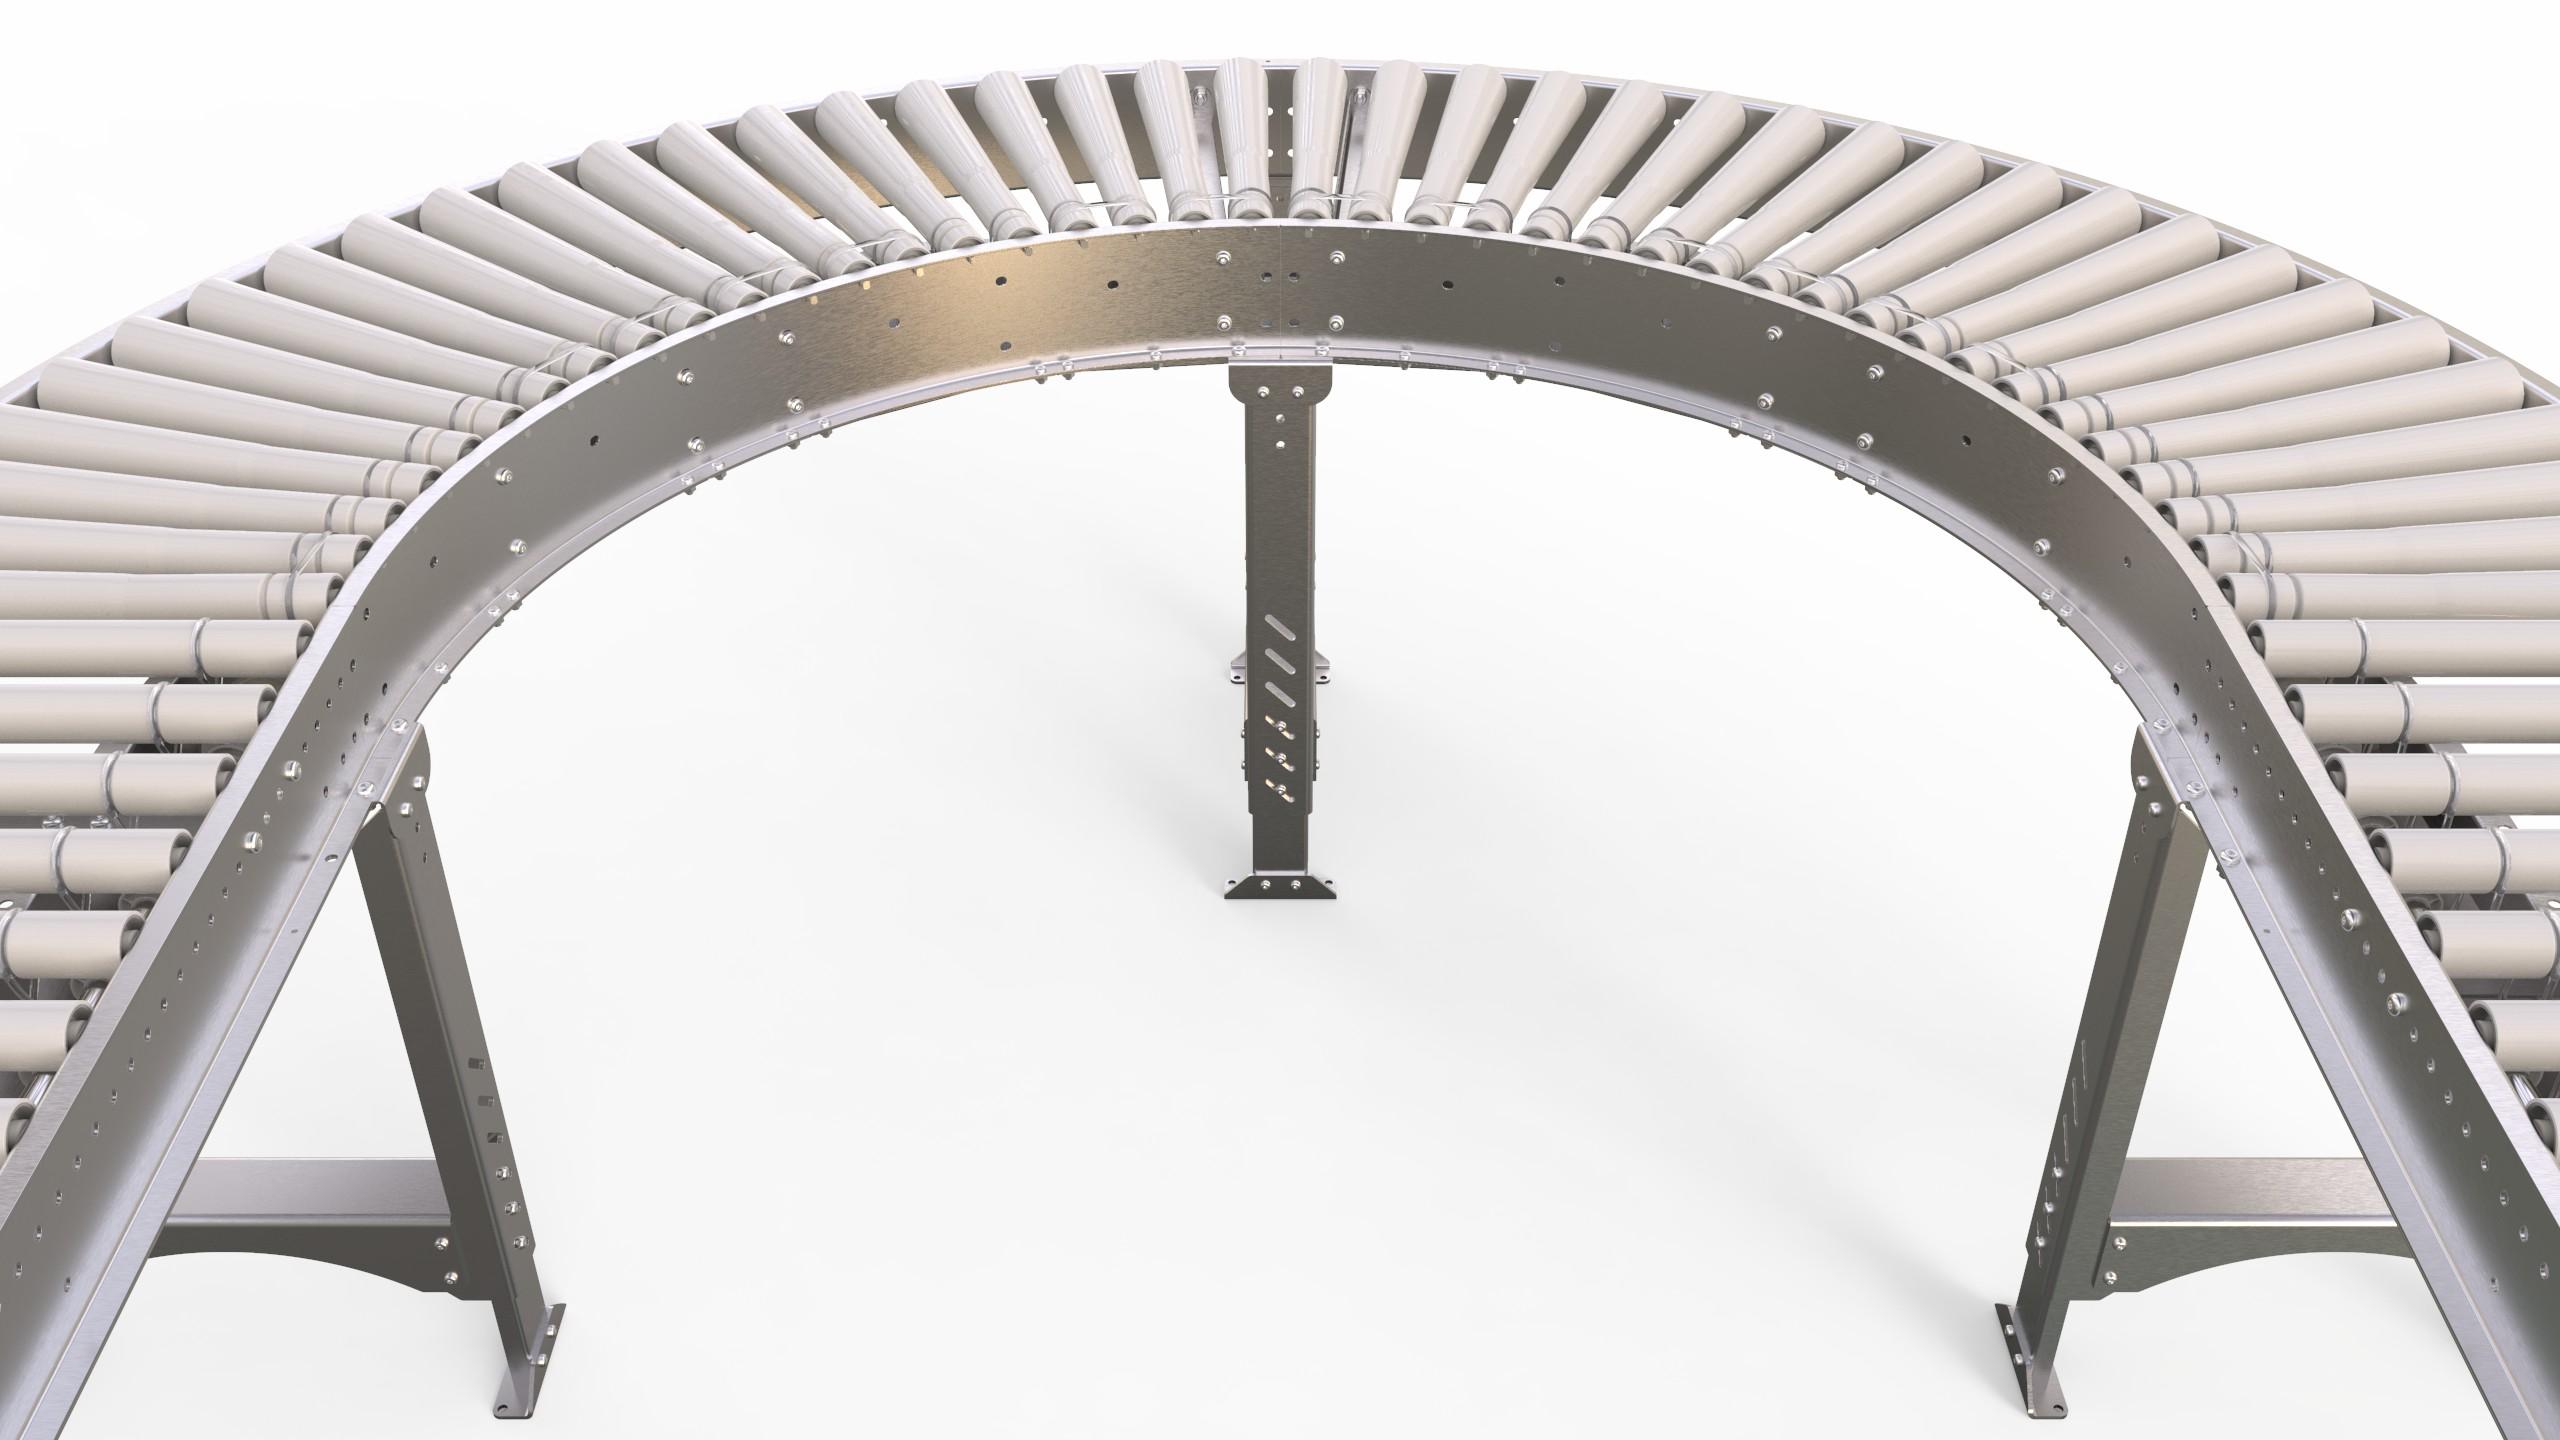 Tranzband (Lineshaft) Powered Roller Conveyor | Dyno